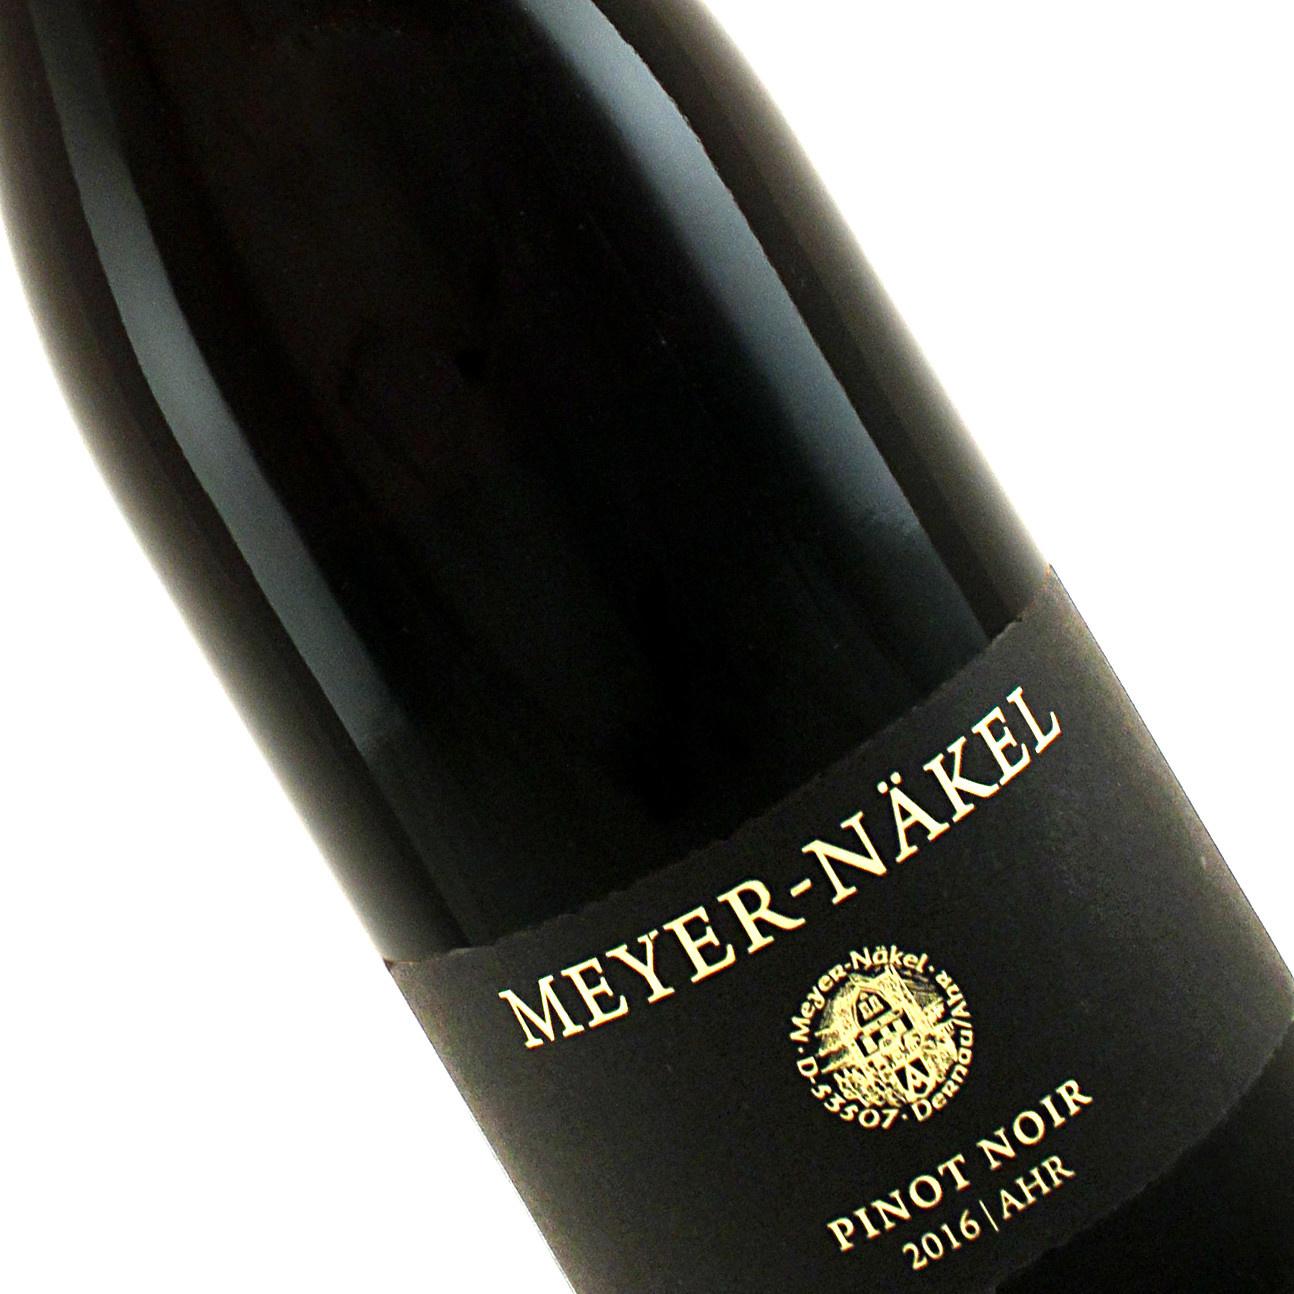 Meyer-Nakel 2016 Spatburgunder Pinot Noir, Ahr Germany